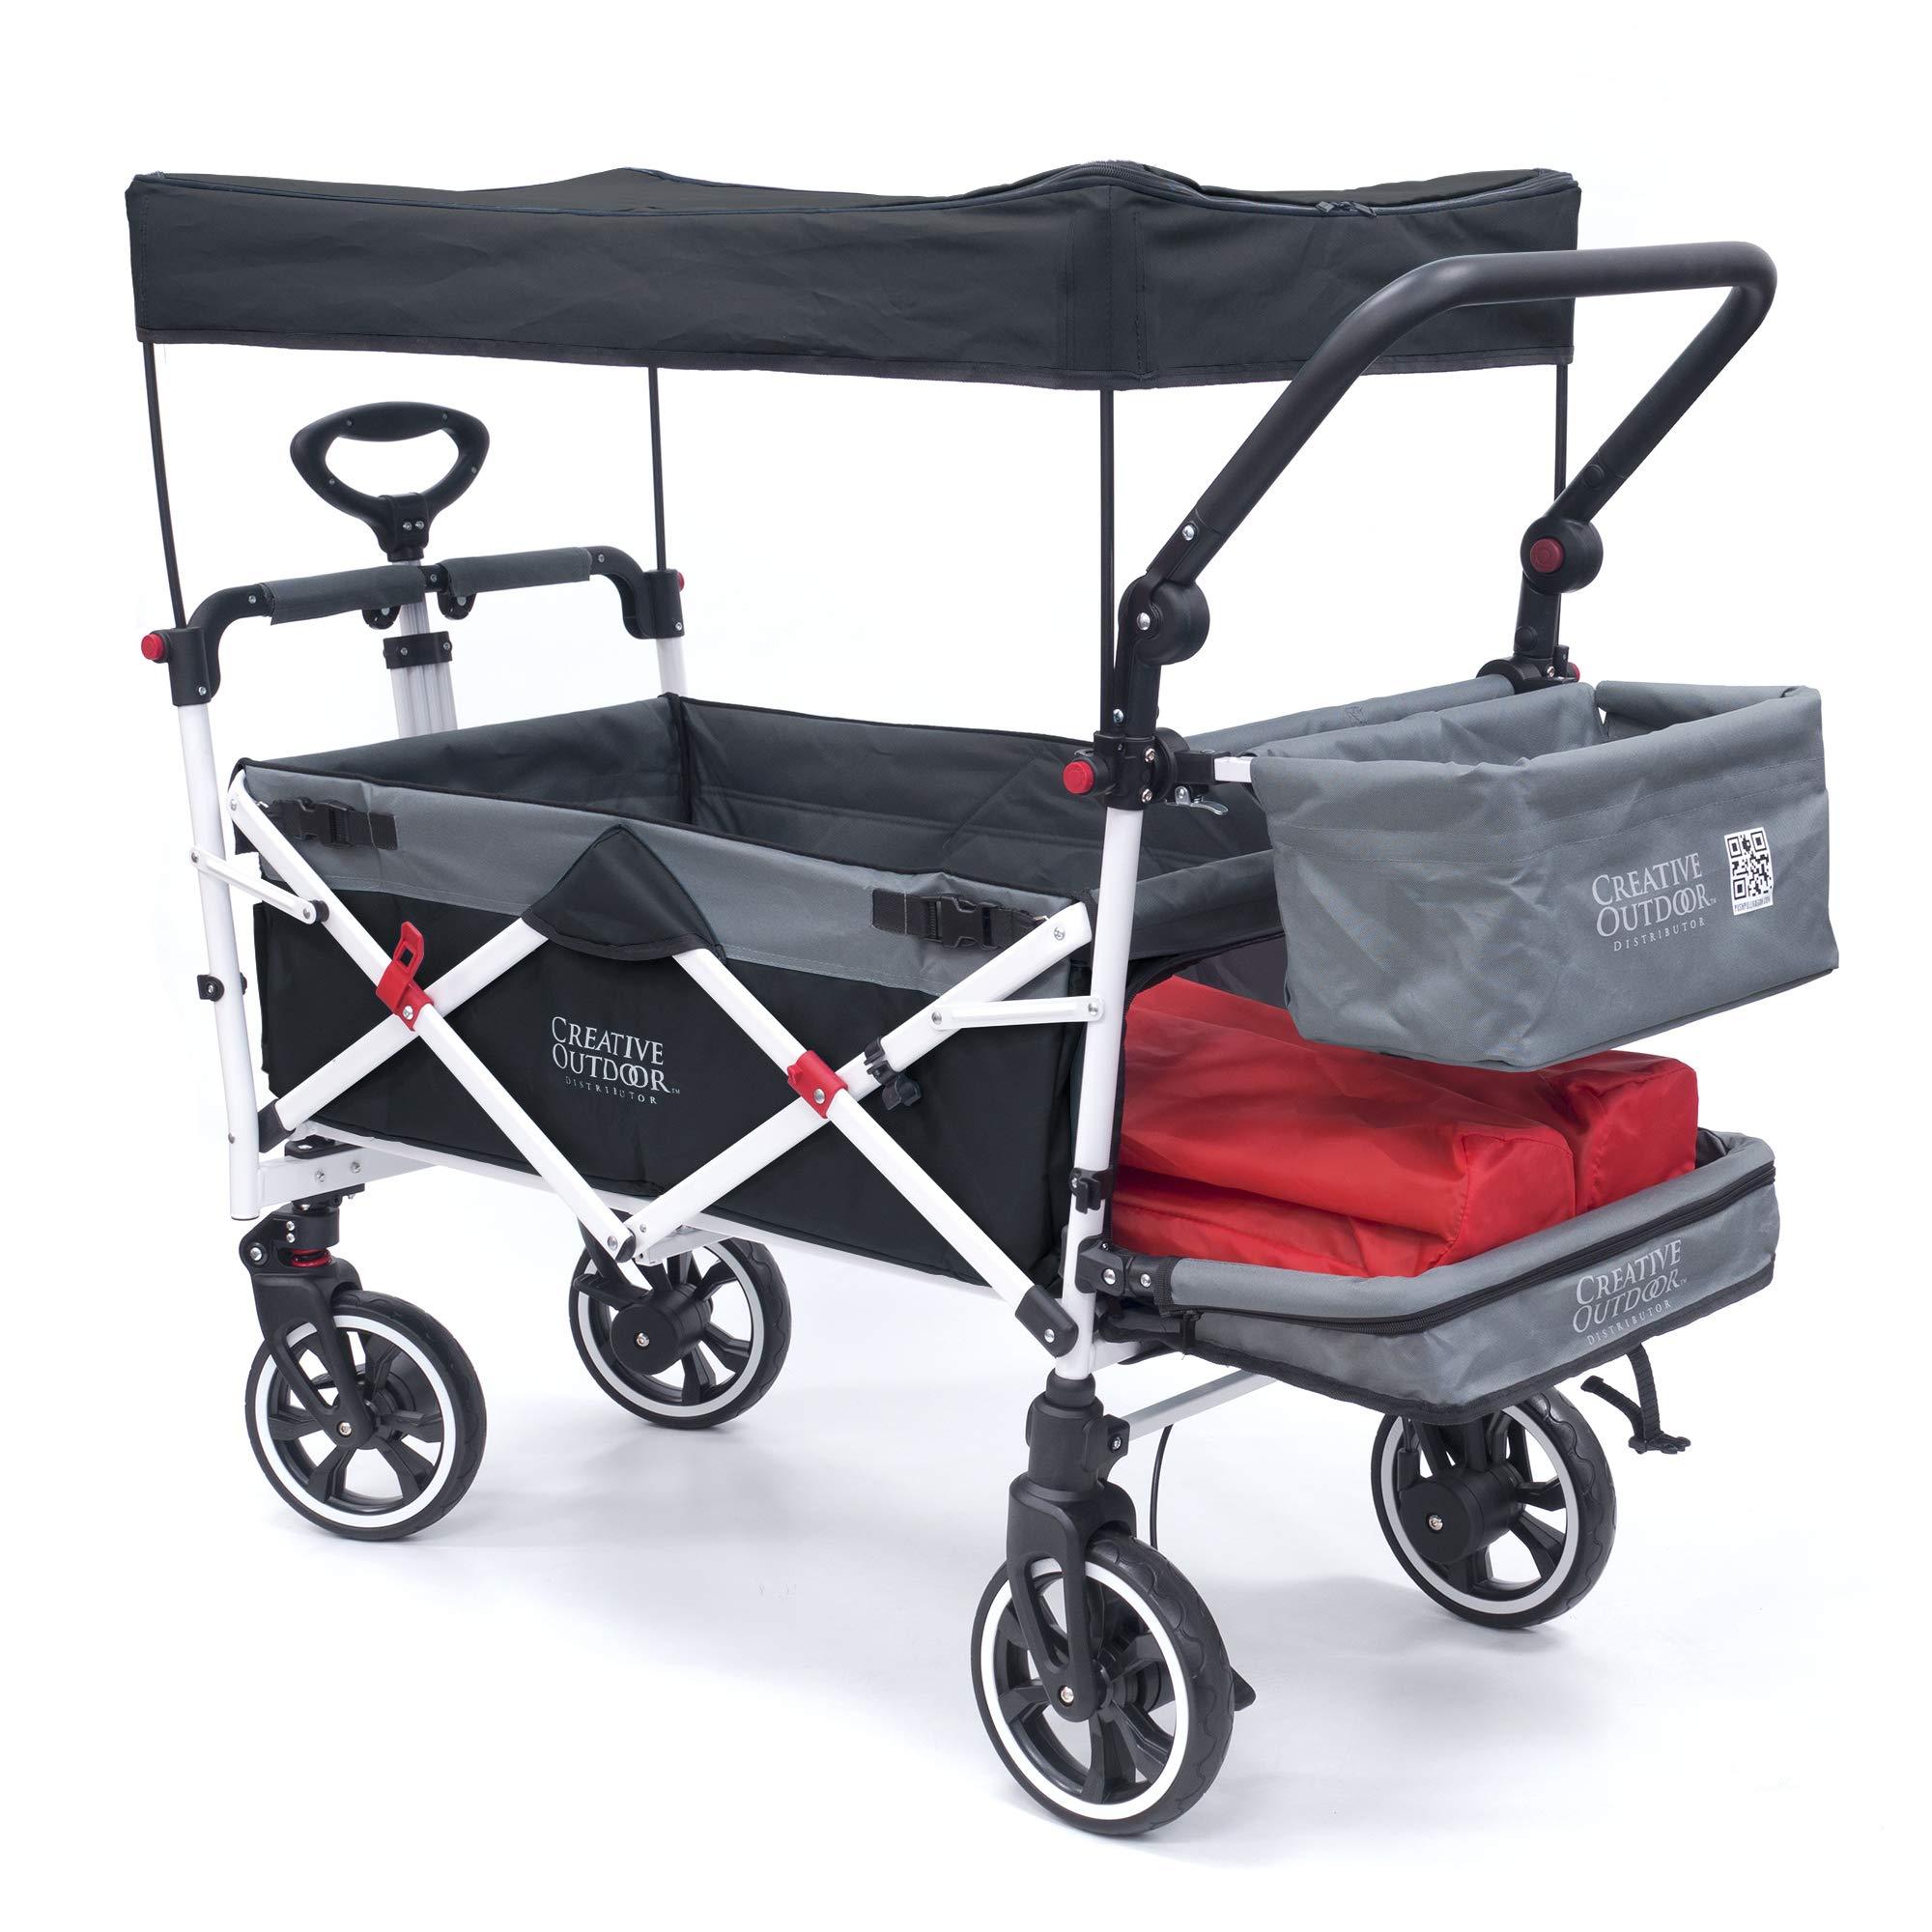 Creative Outdoor Push Pull Collapsible Folding Wagon Stroller Cart for Kids   Titanium Series   Beach Park Garden & Tailgate (Black)